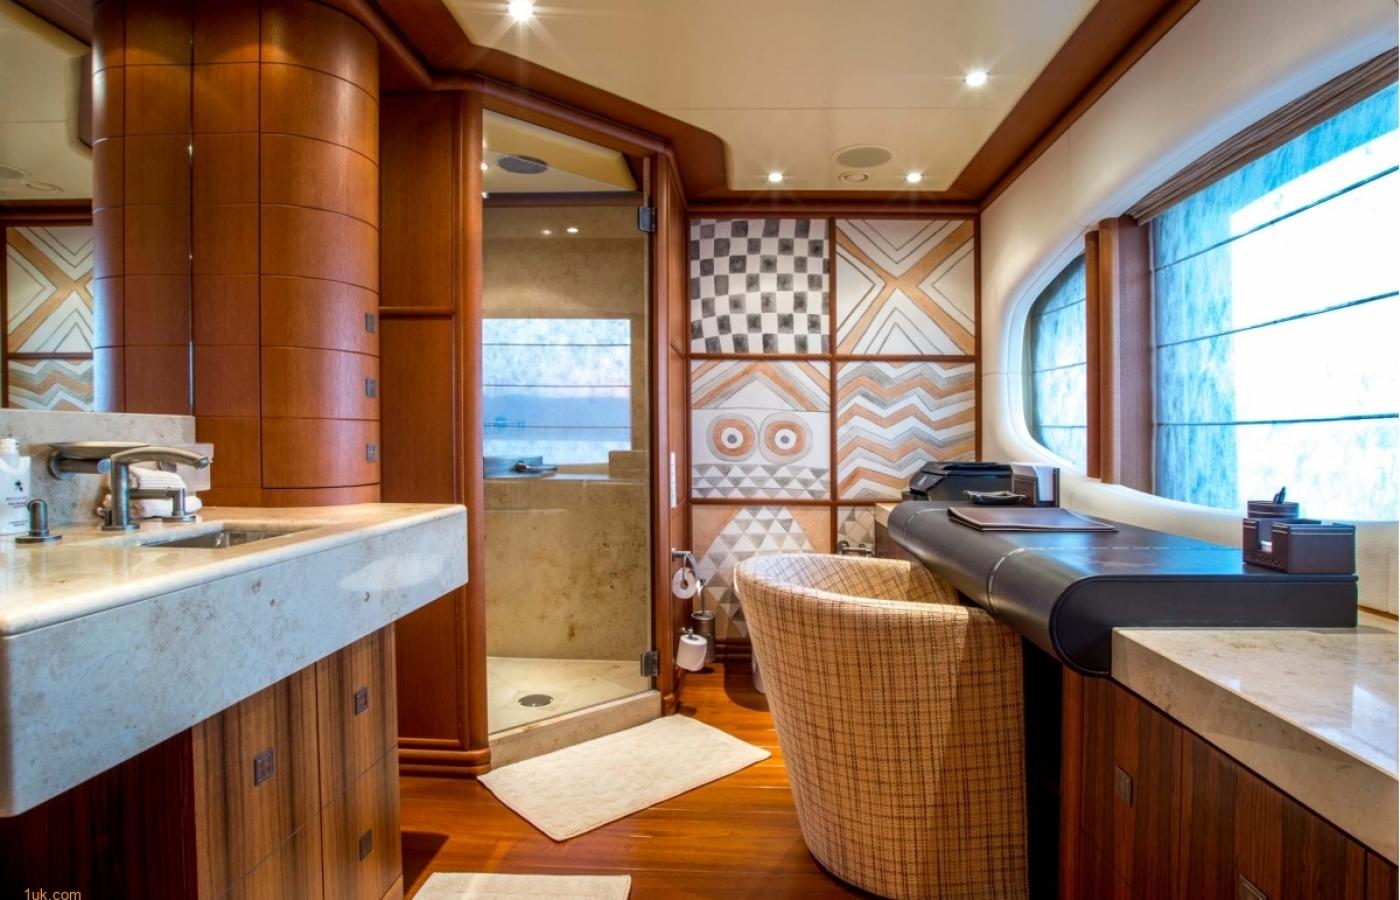 urry-cabin-office-bathroom